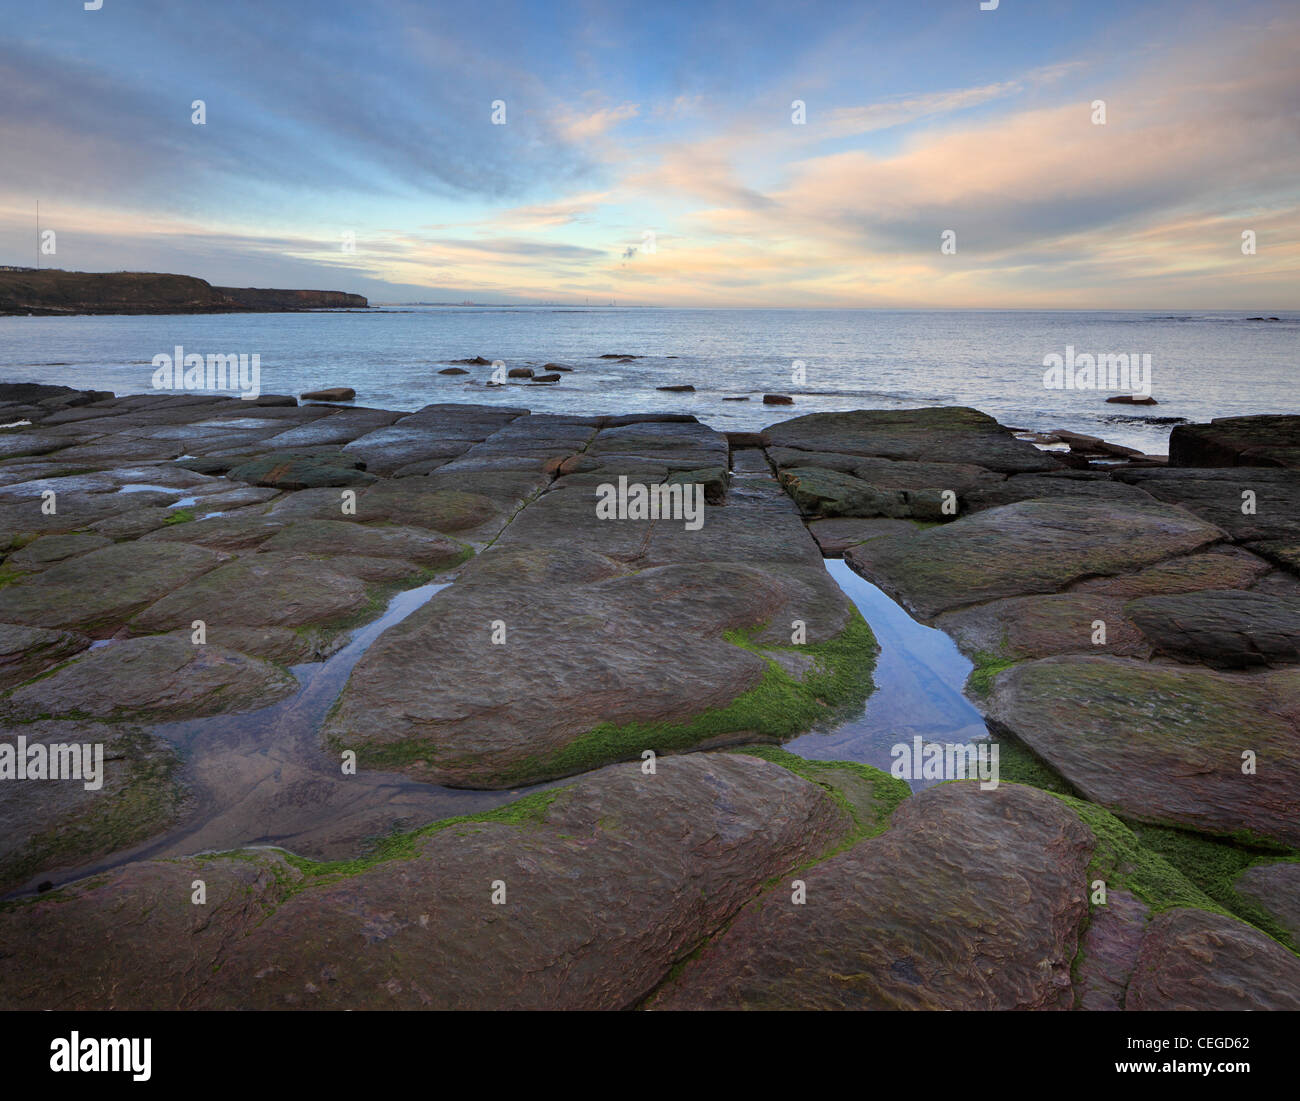 Dusk over Whitley Bay North Tyneside, Tyne and Wear, Northumberland, England - Stock Image